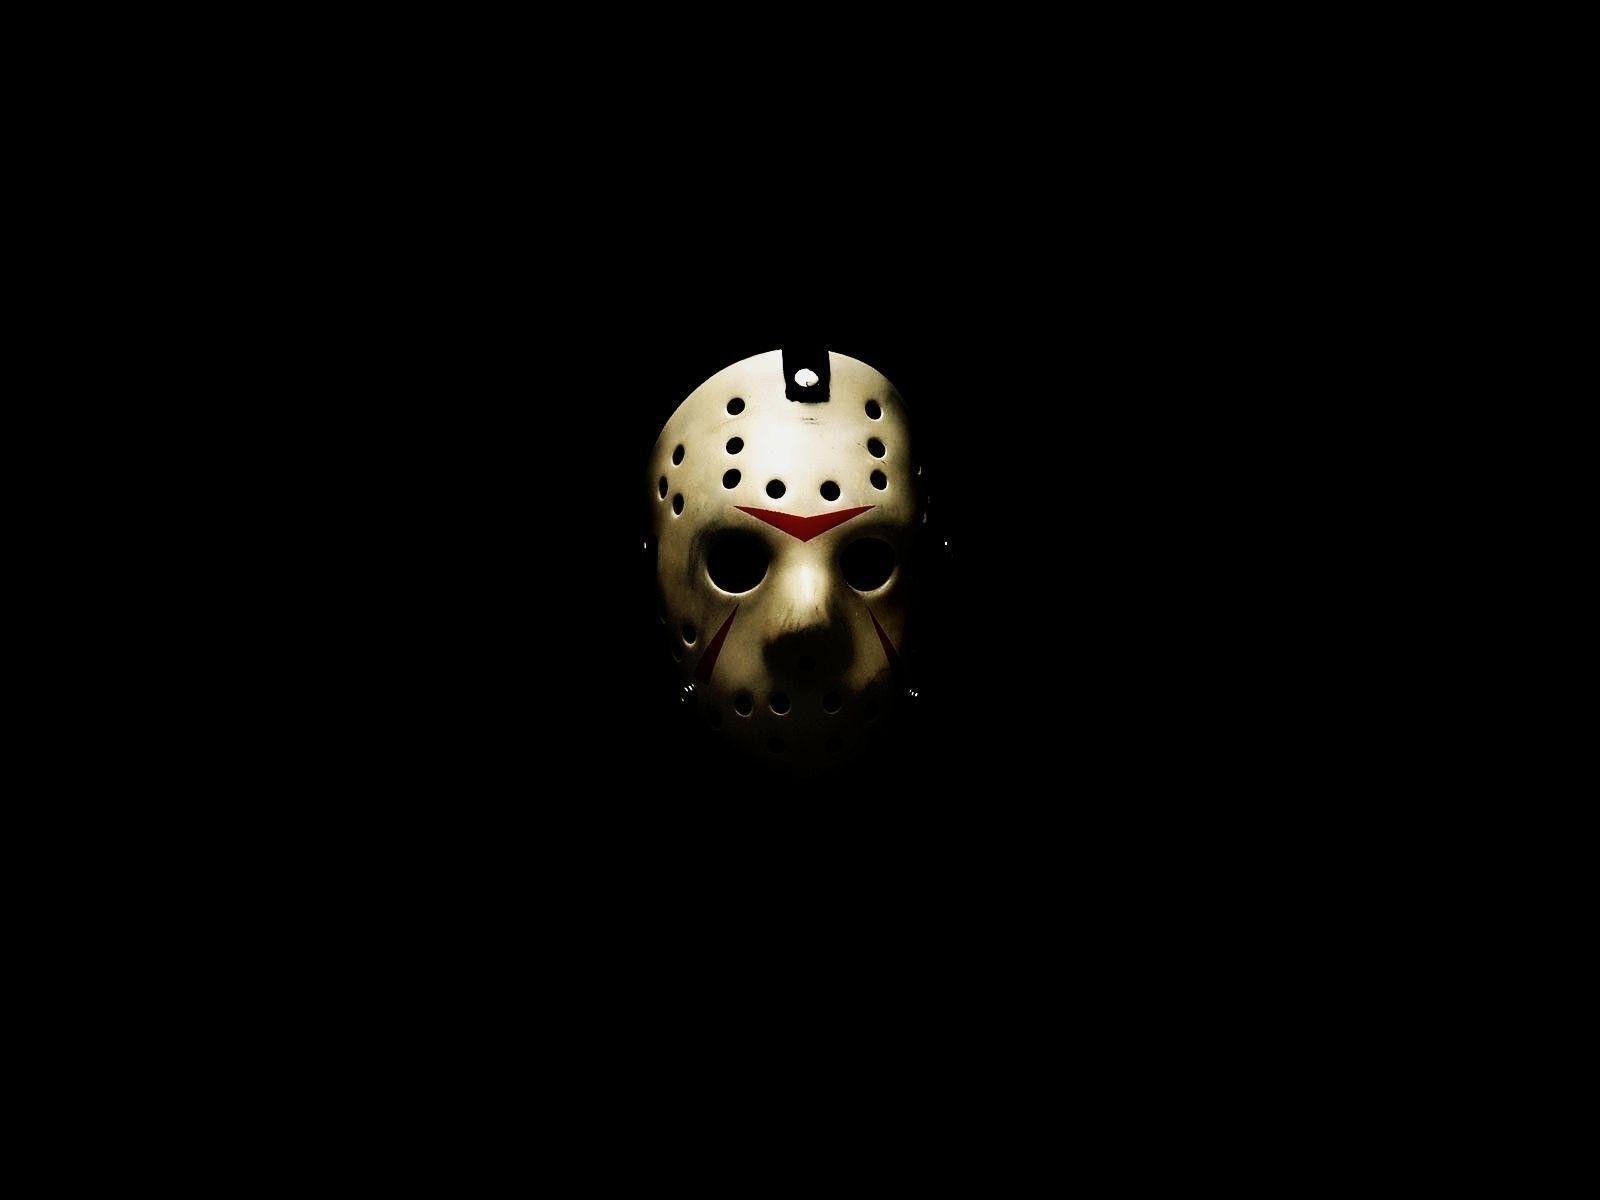 Jason Mask Wallpaper